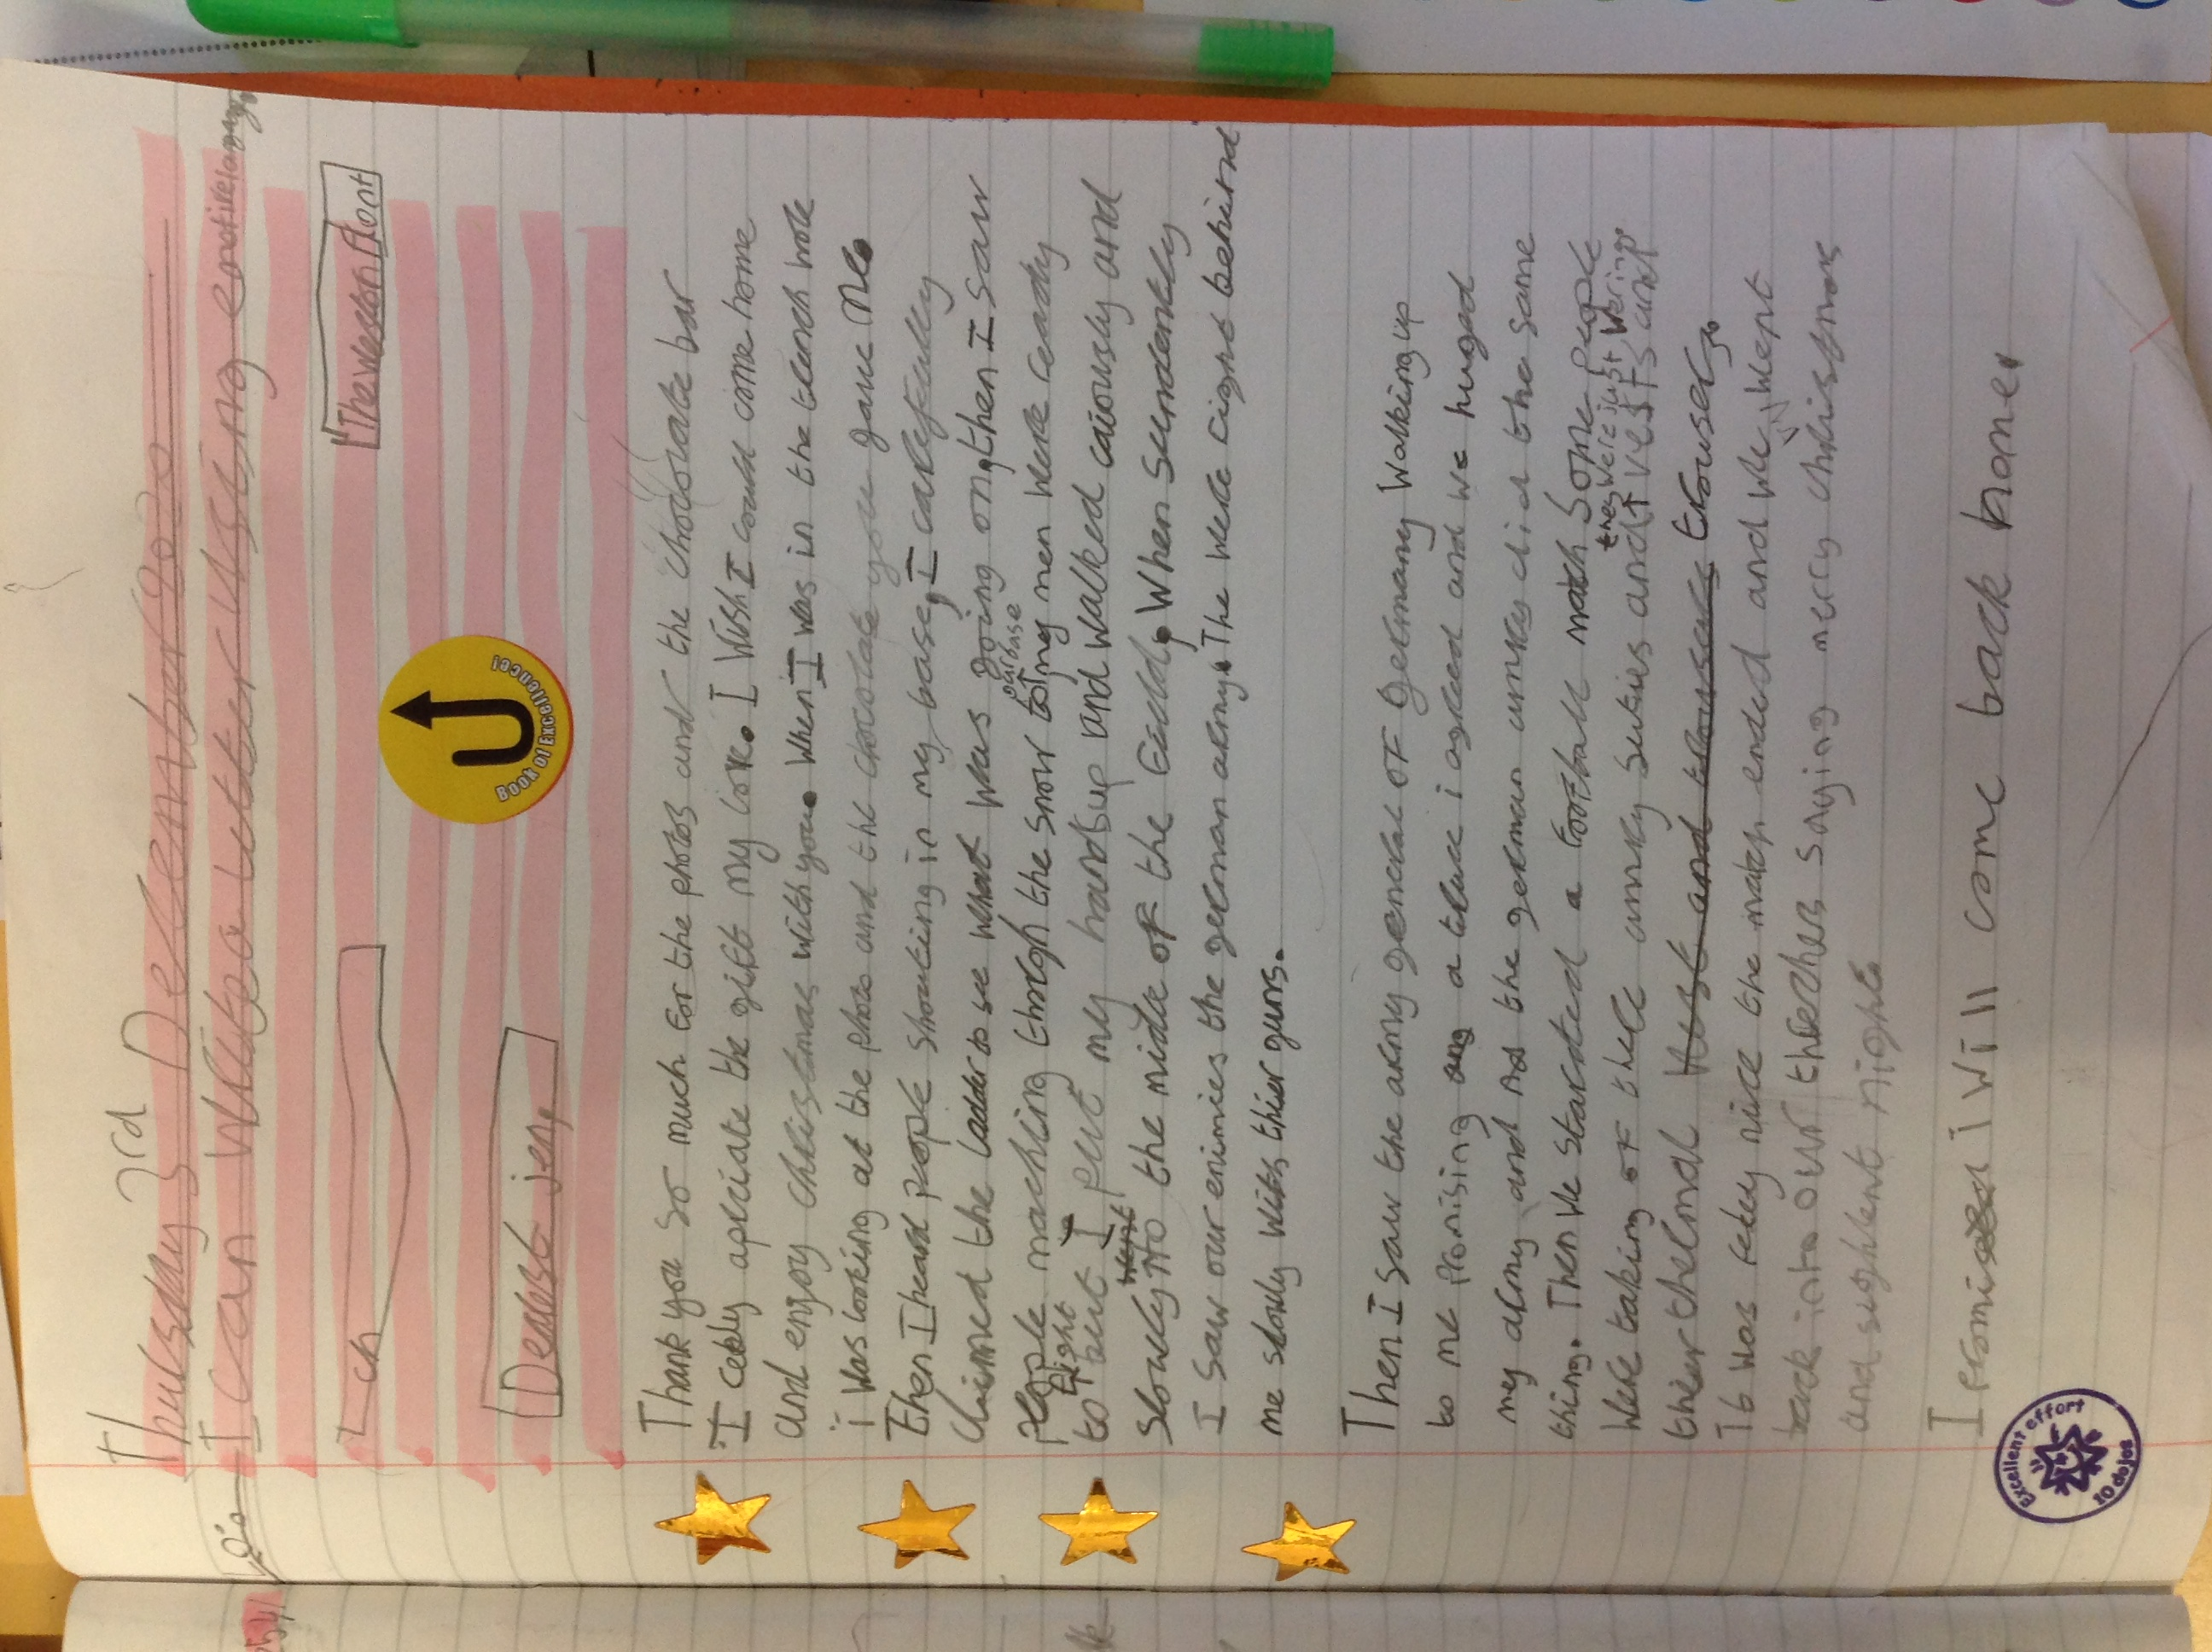 Vinul's wonderful writing!